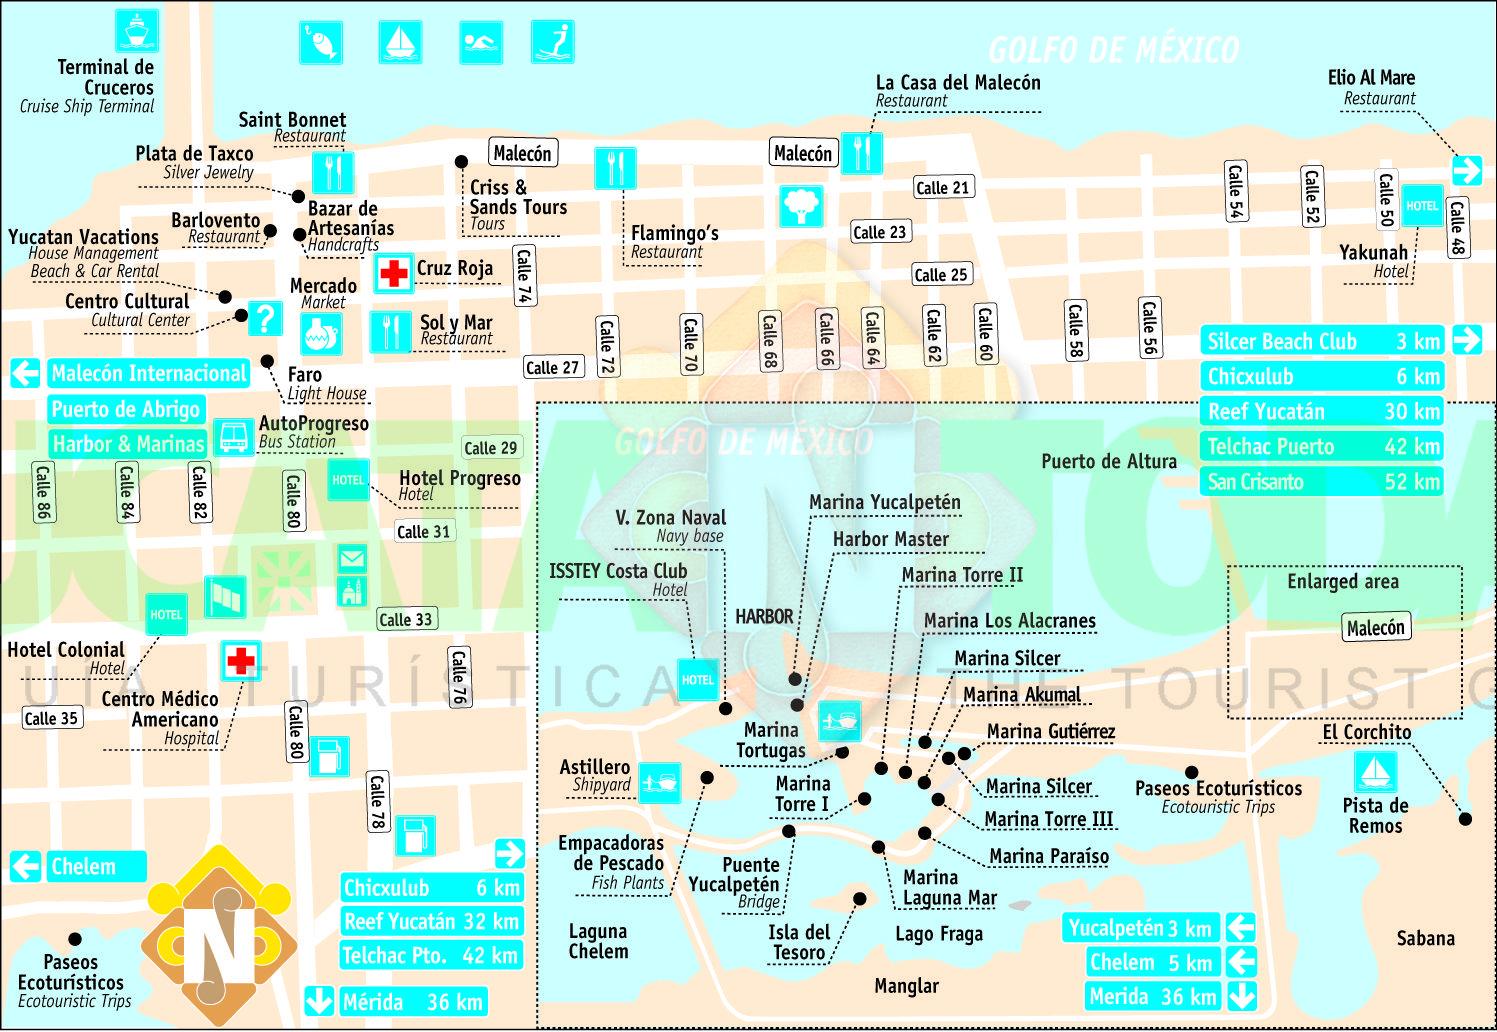 Progreso Yucatan Port Progreso Map Yucatan Today cruise